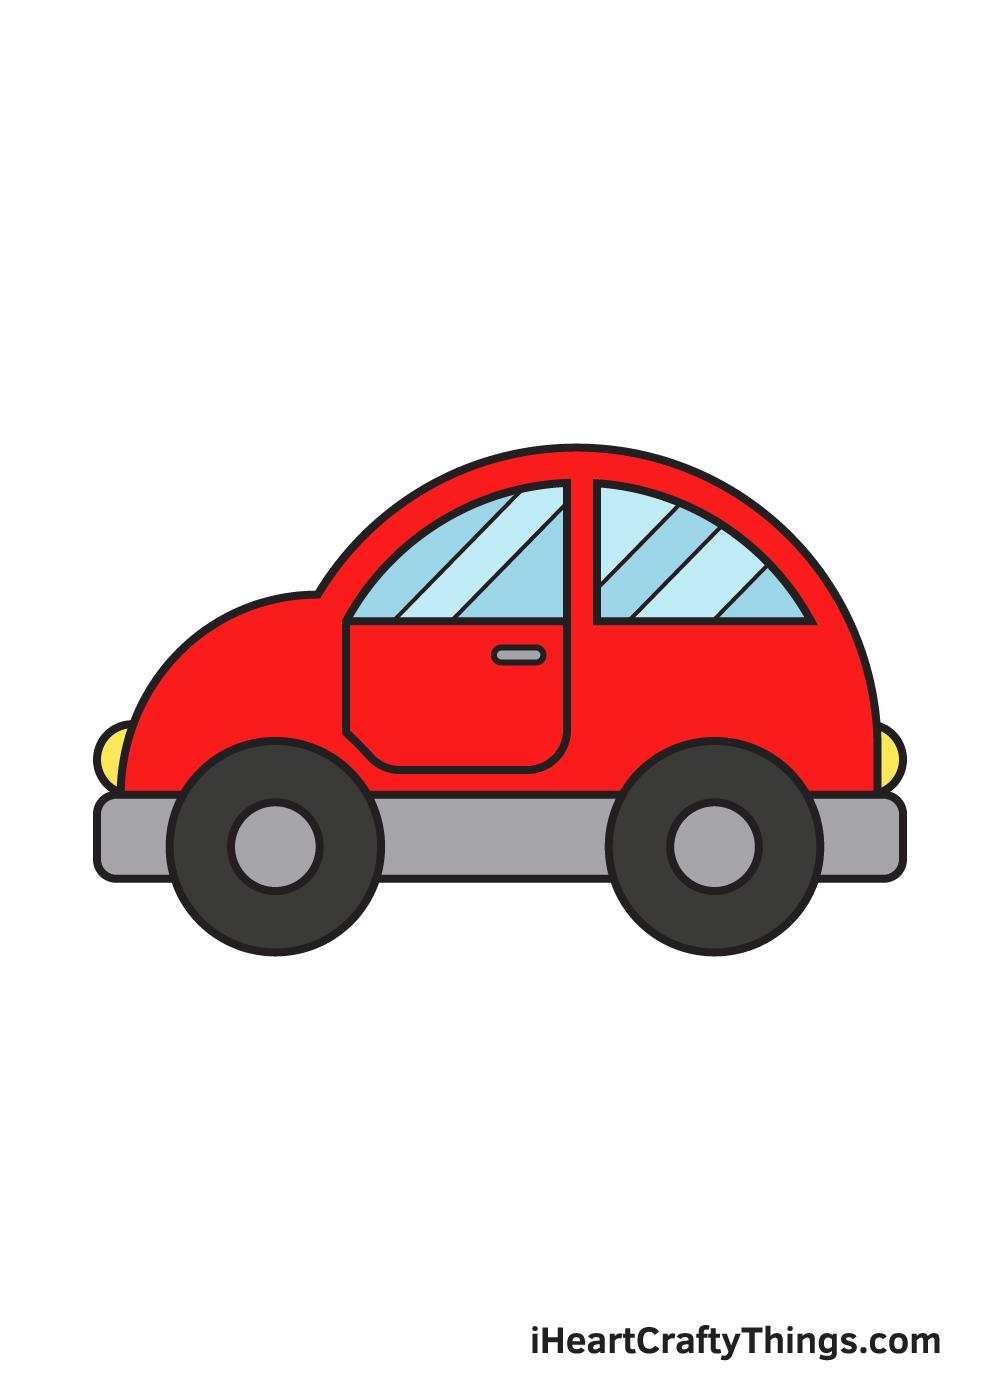 car drawing – 9 steps